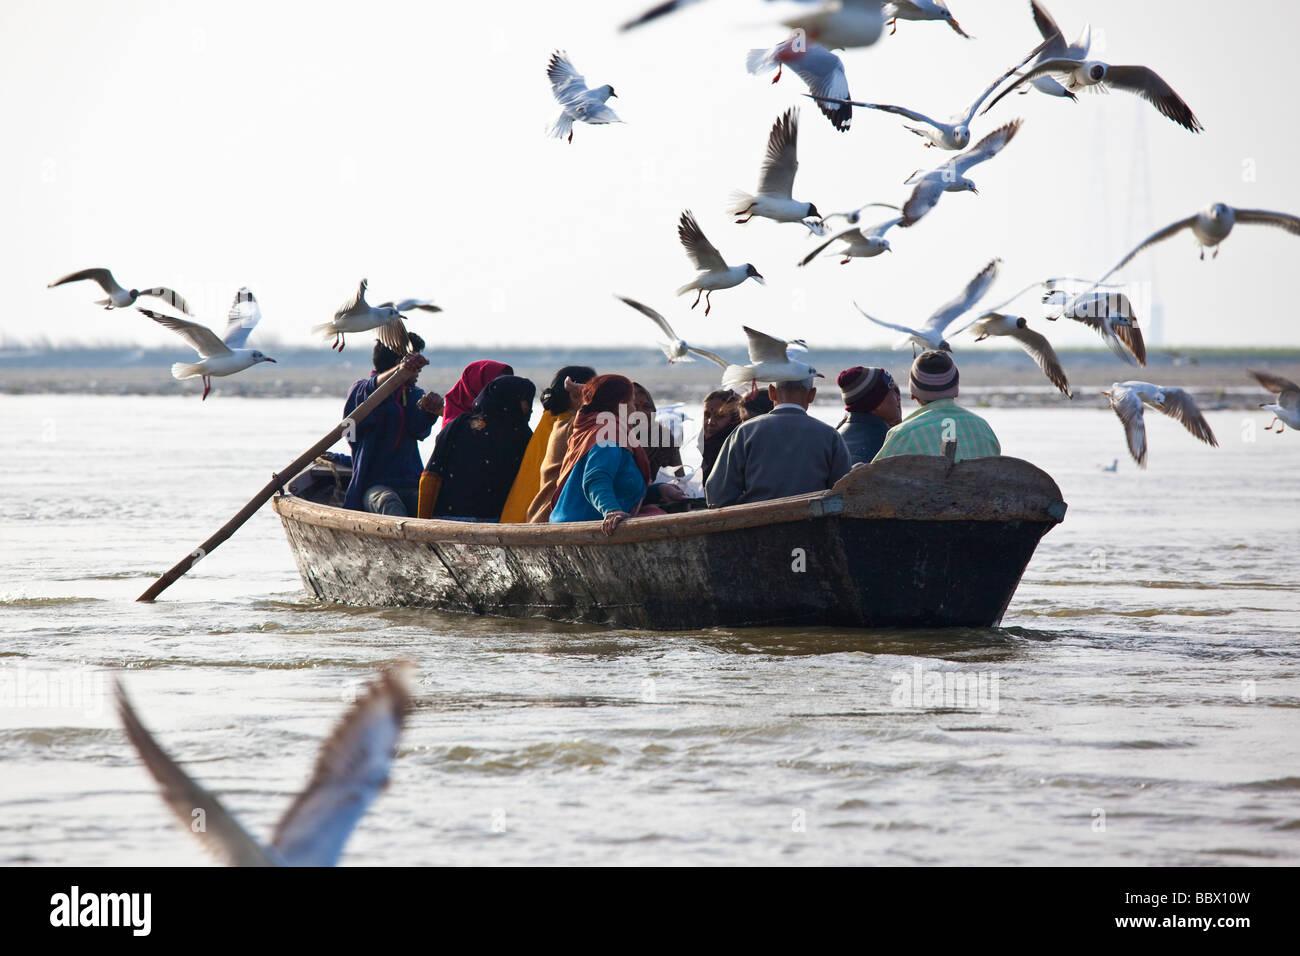 Fieles hindúes va a la confluencia del río Ganga en Allahbad India Imagen De Stock